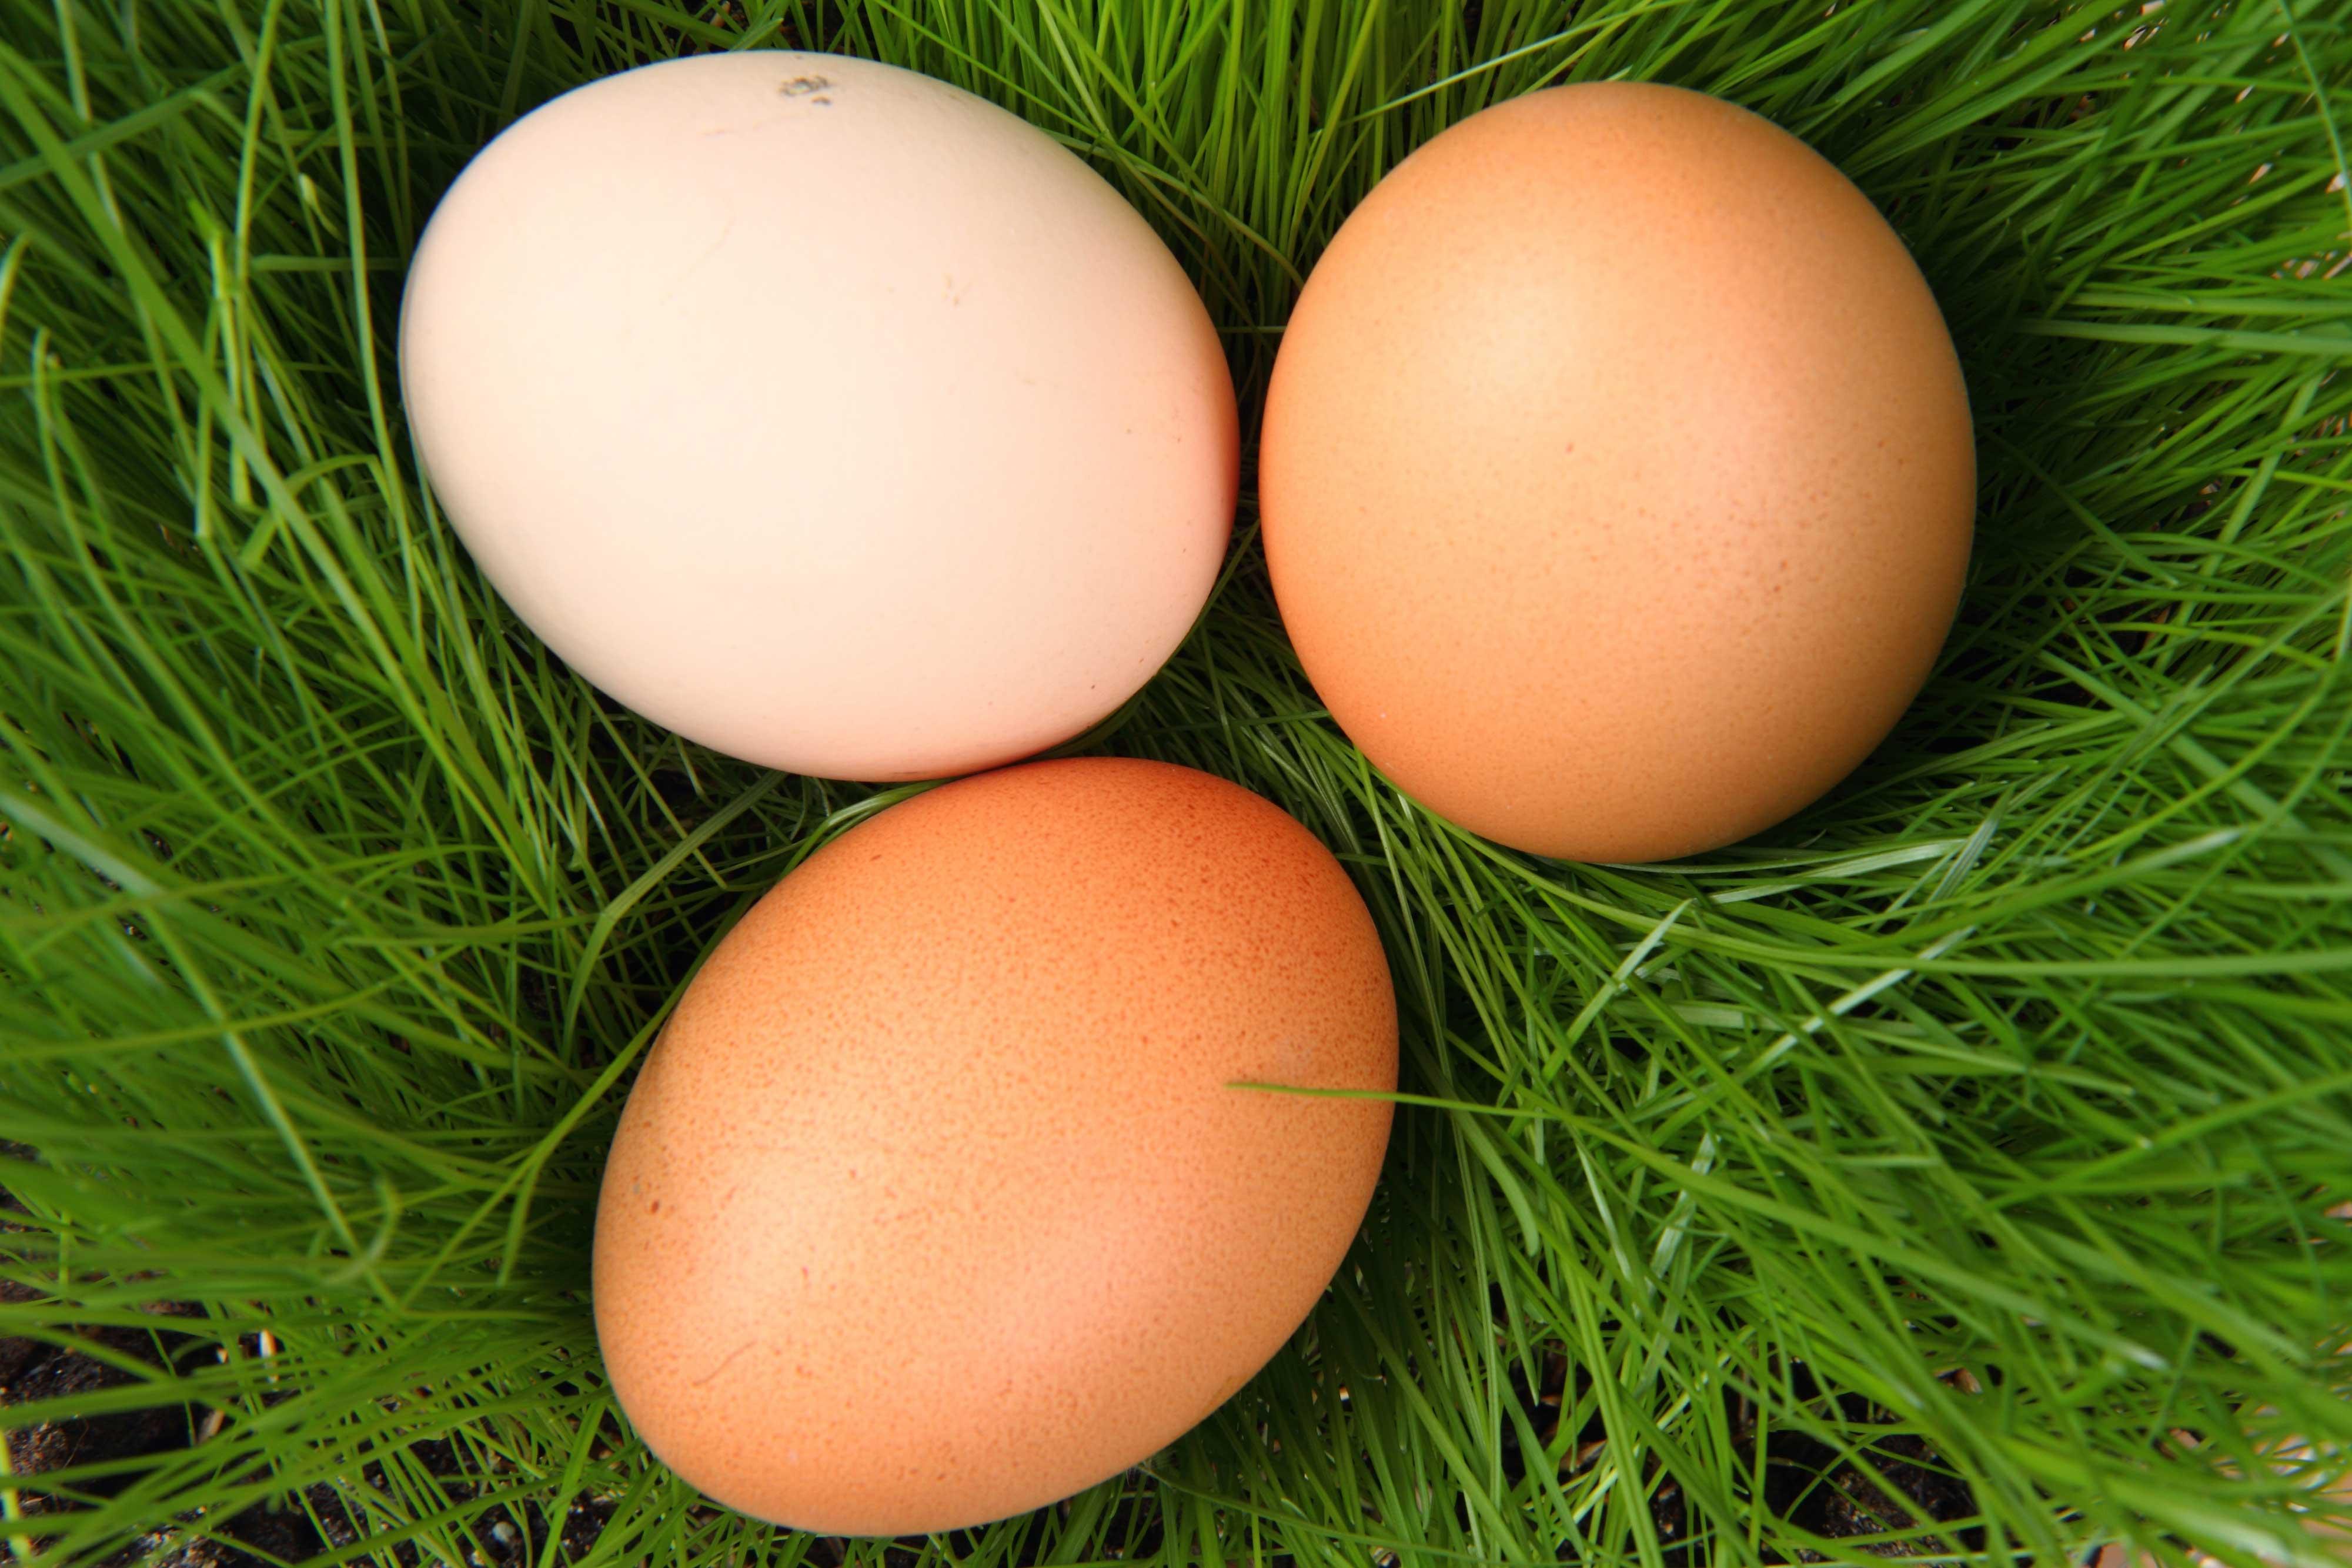 various egg colours symbolising female egg cells